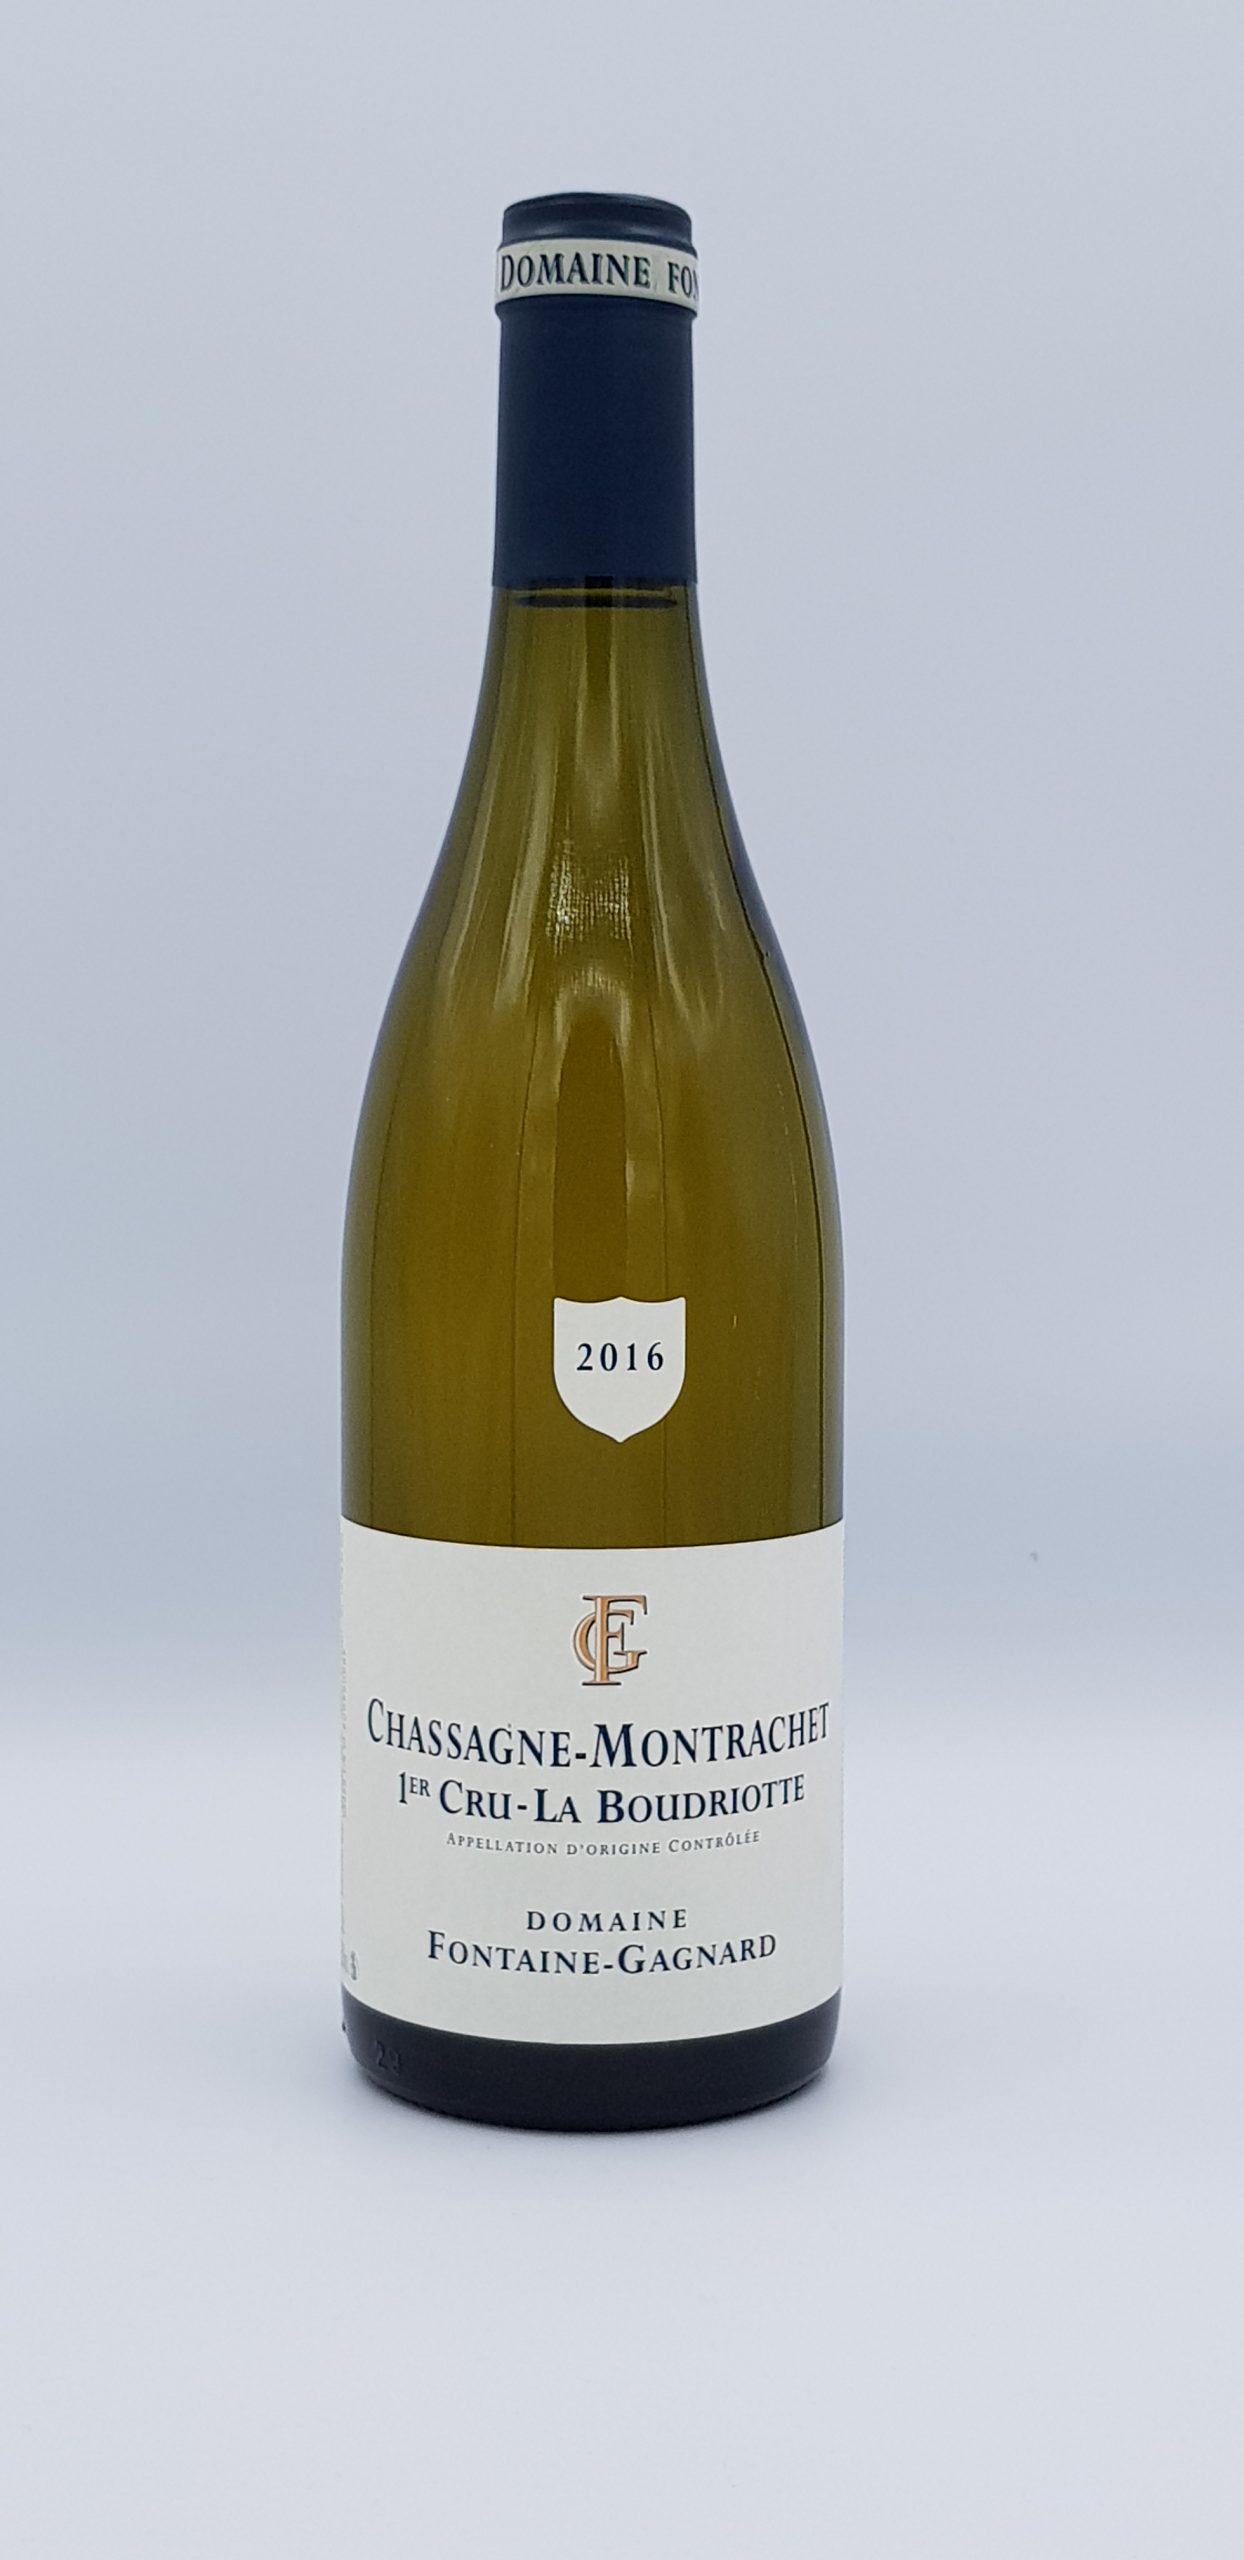 Bourgogne Chassagne Montrachet 2016 Caillerets  Dom Fontaine Gagnard